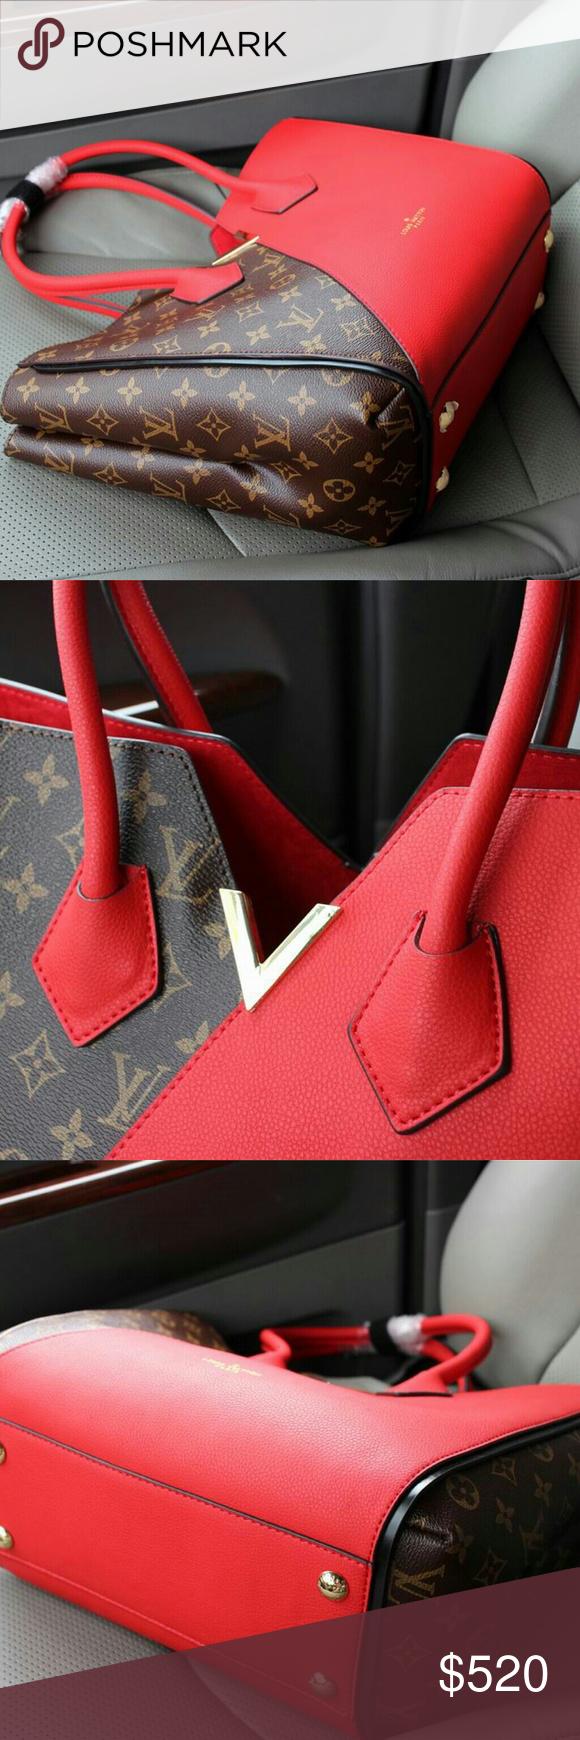 3cd5297e47c6 Spotted while shopping on Poshmark  Read Description new year gifts  Handbags Bags!  poshmark  fashion  shopping  style  louis vuitton  Handbags